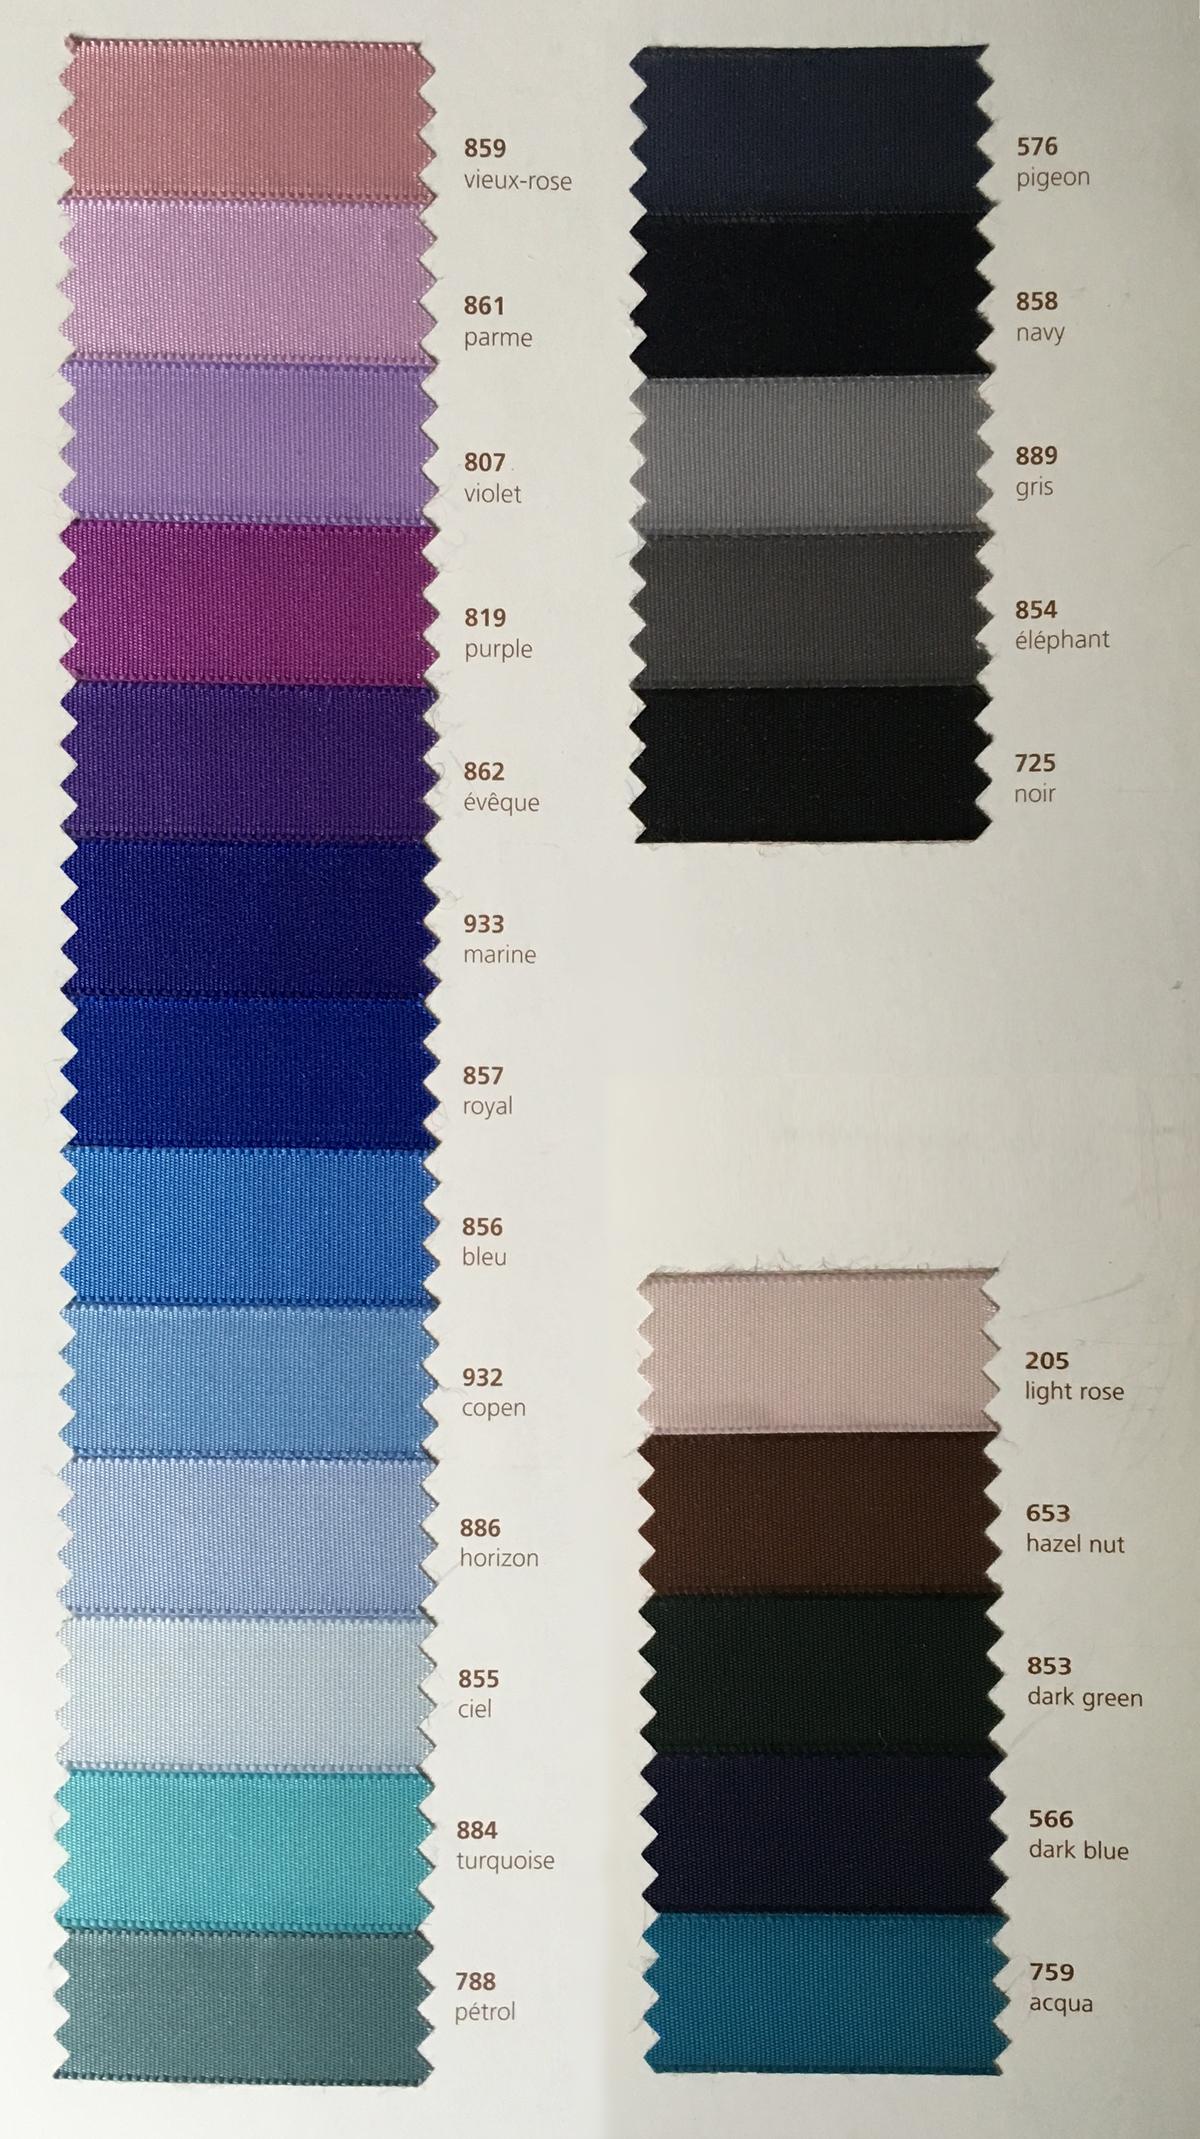 Merino Extrafine 28/2, Farbkarte A101 - A130